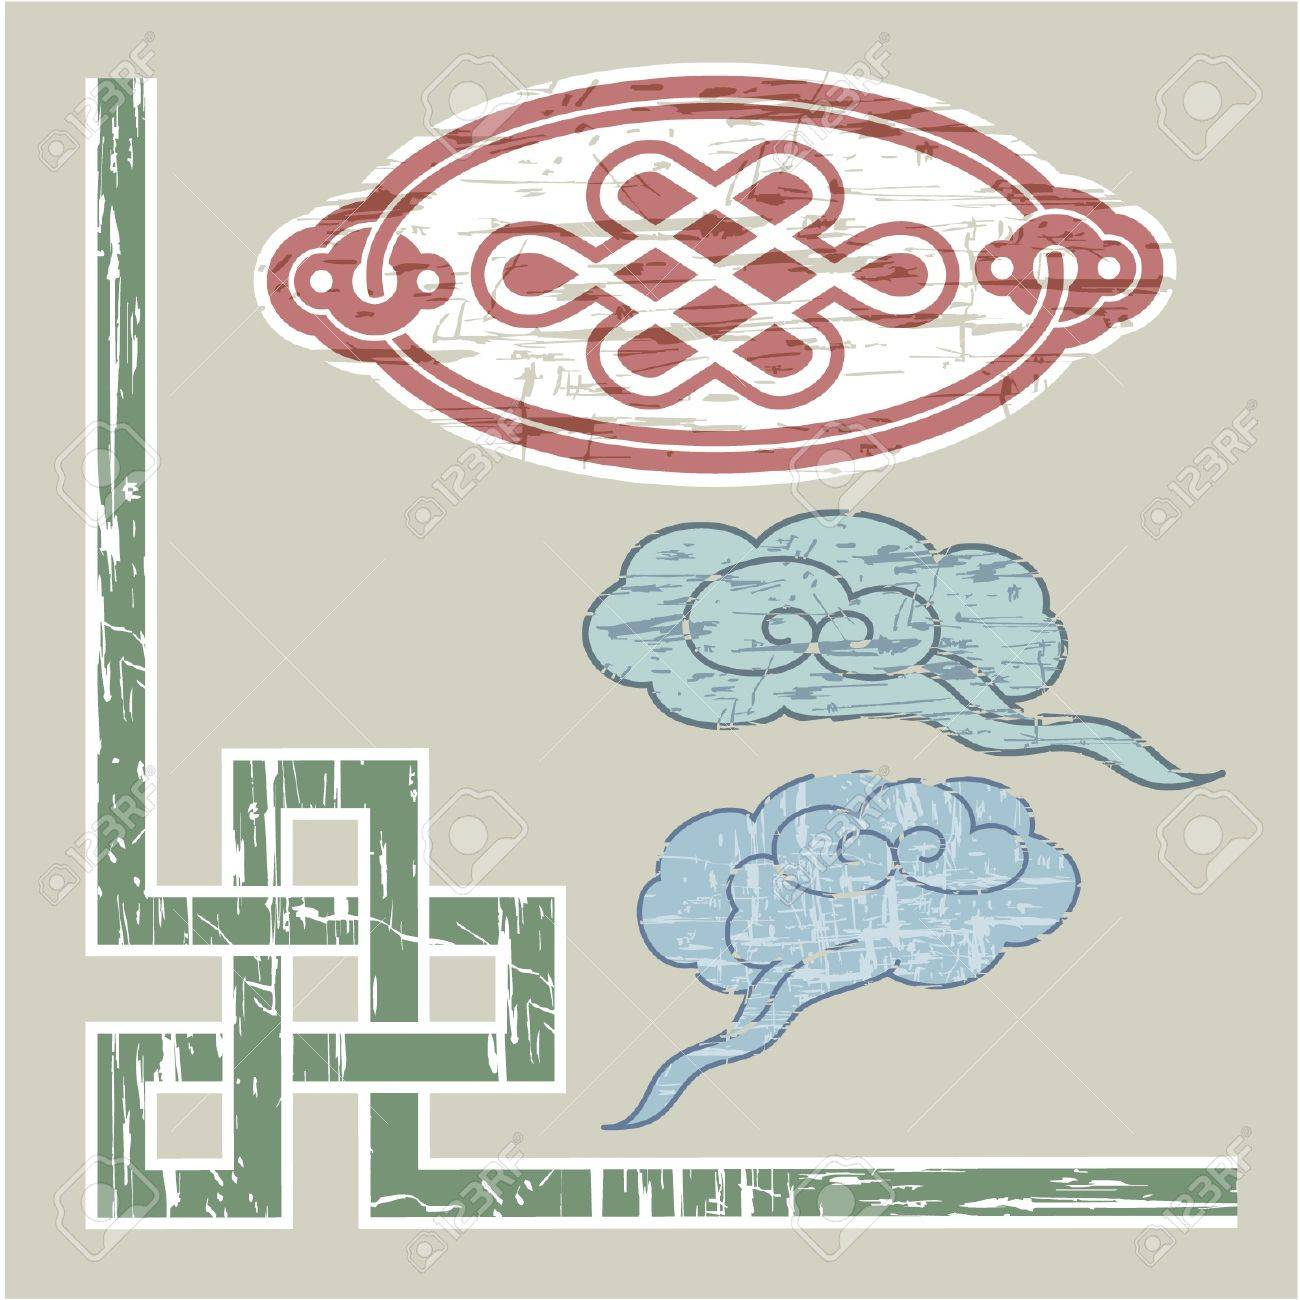 Oriental Border and Ornament Stock Vector - 11113854